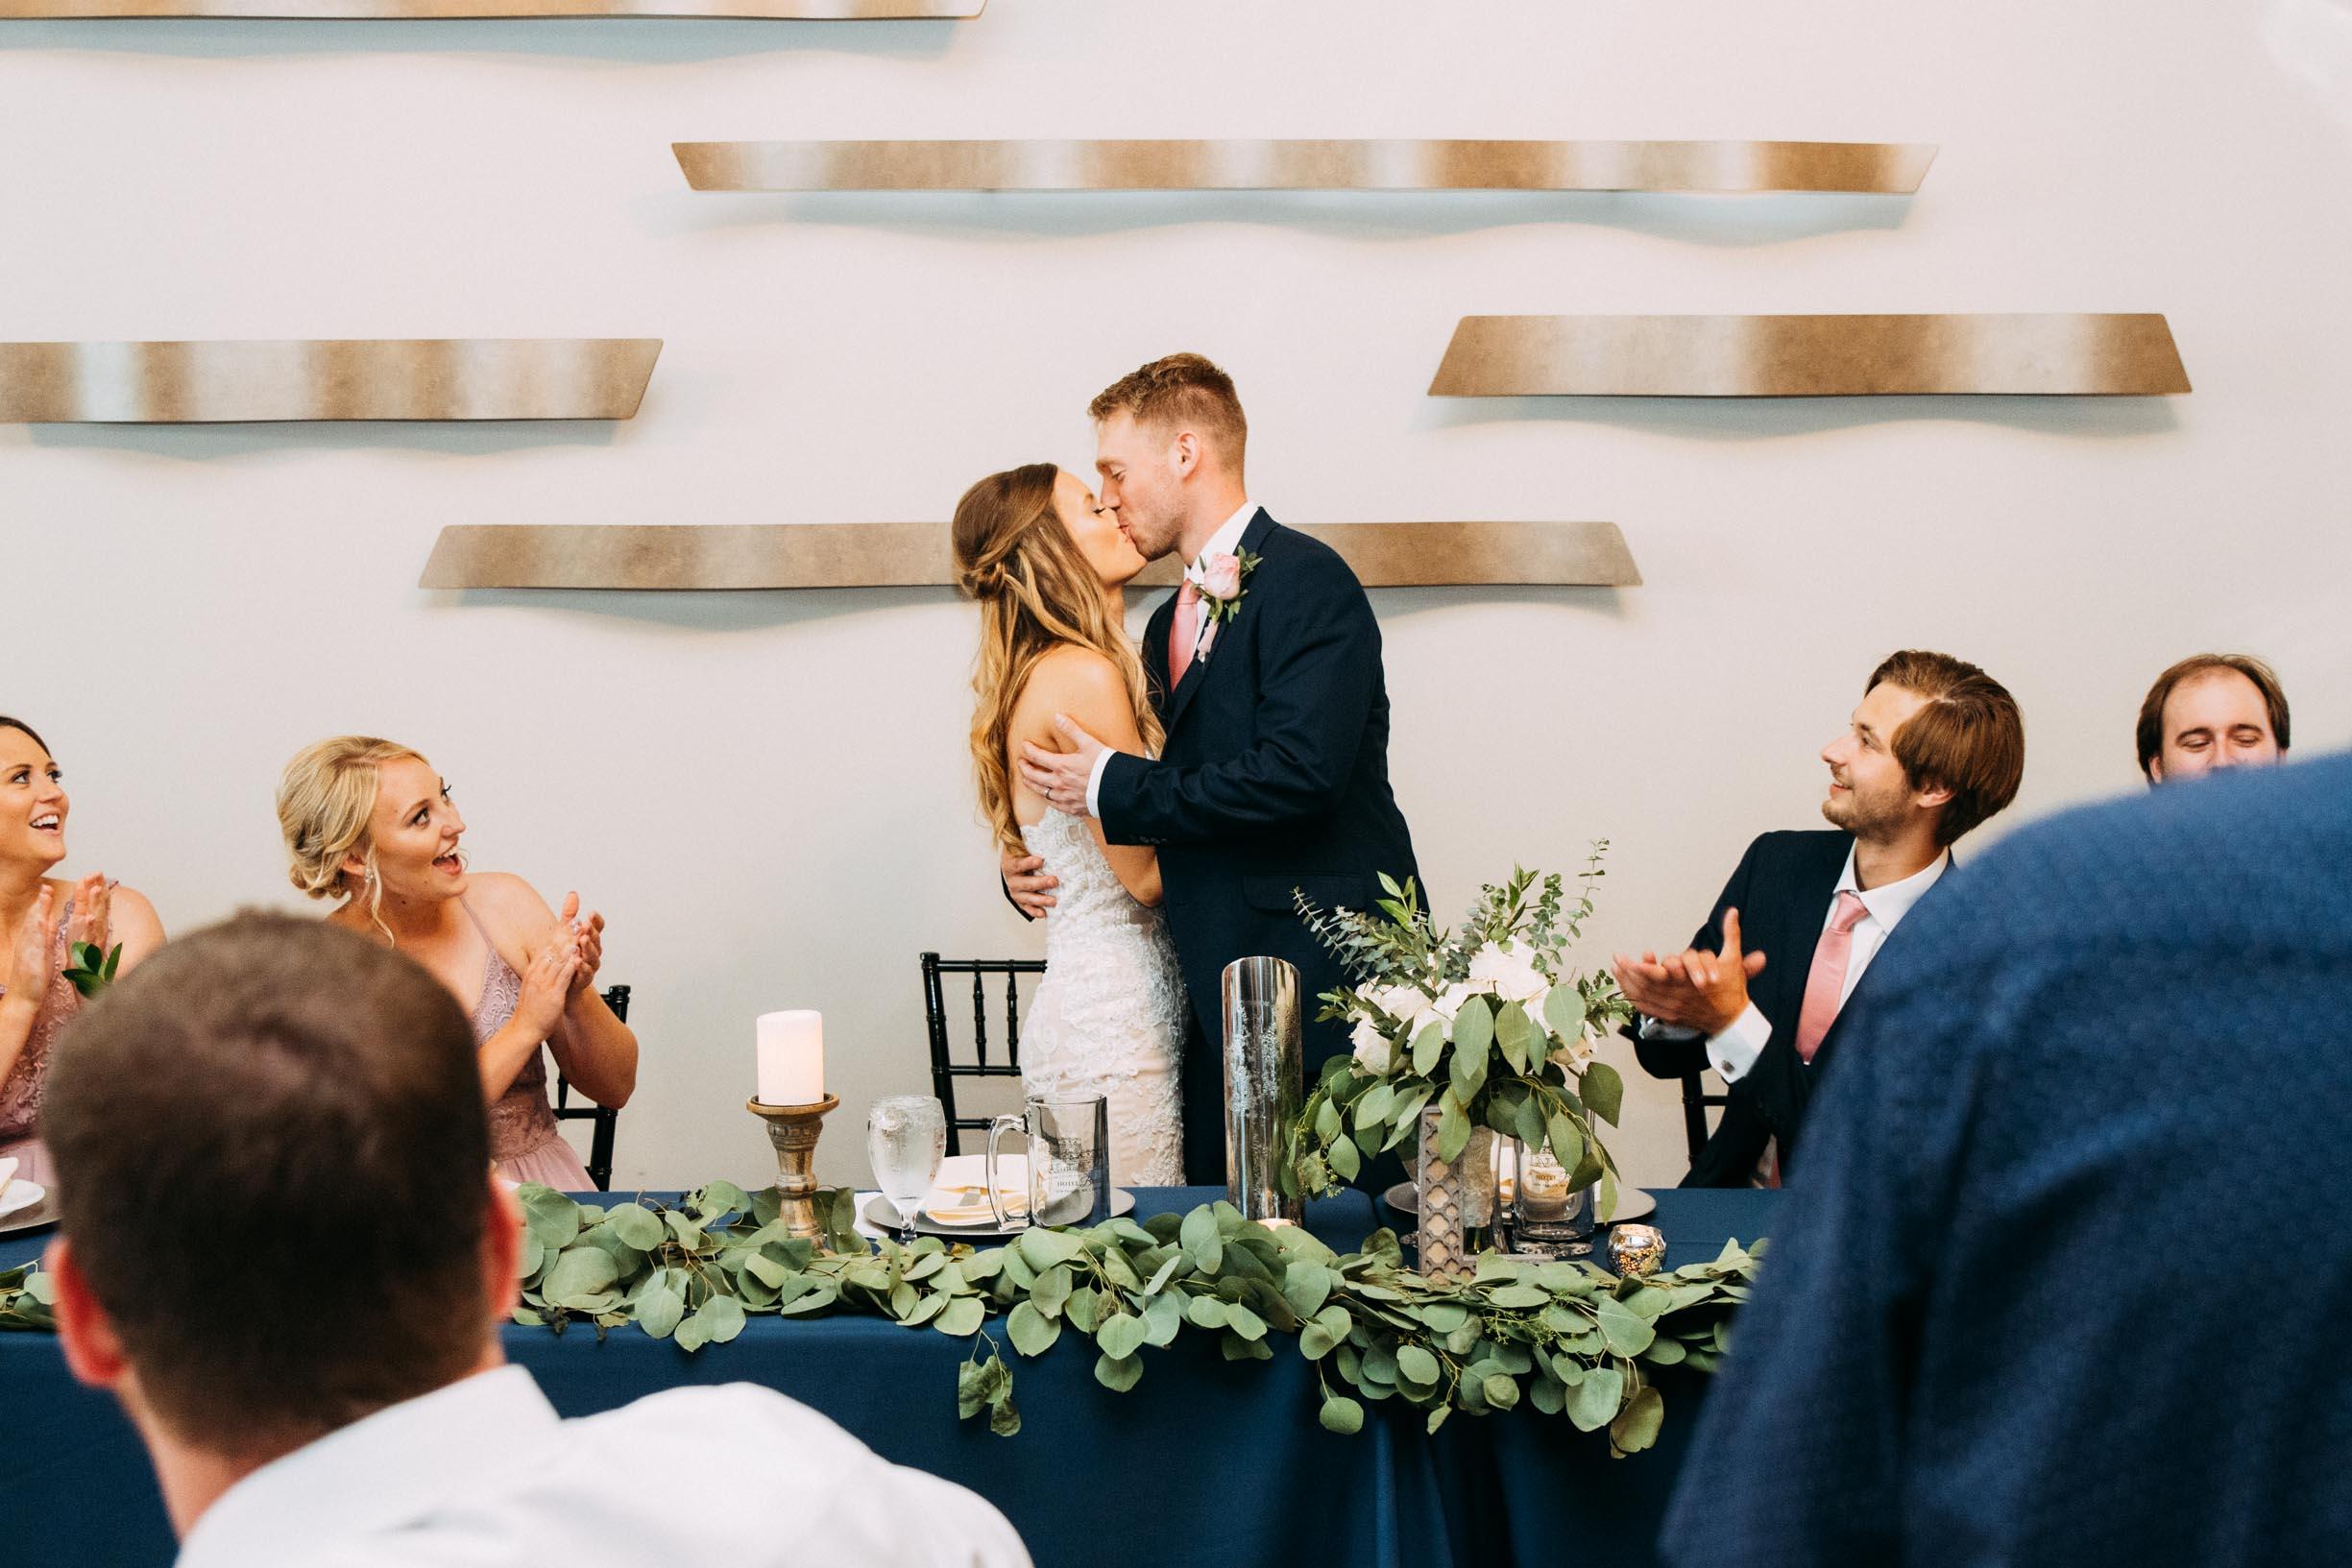 63-WeddingsattheBroz_Minnesota_WeddingBlog_Reception.jpg